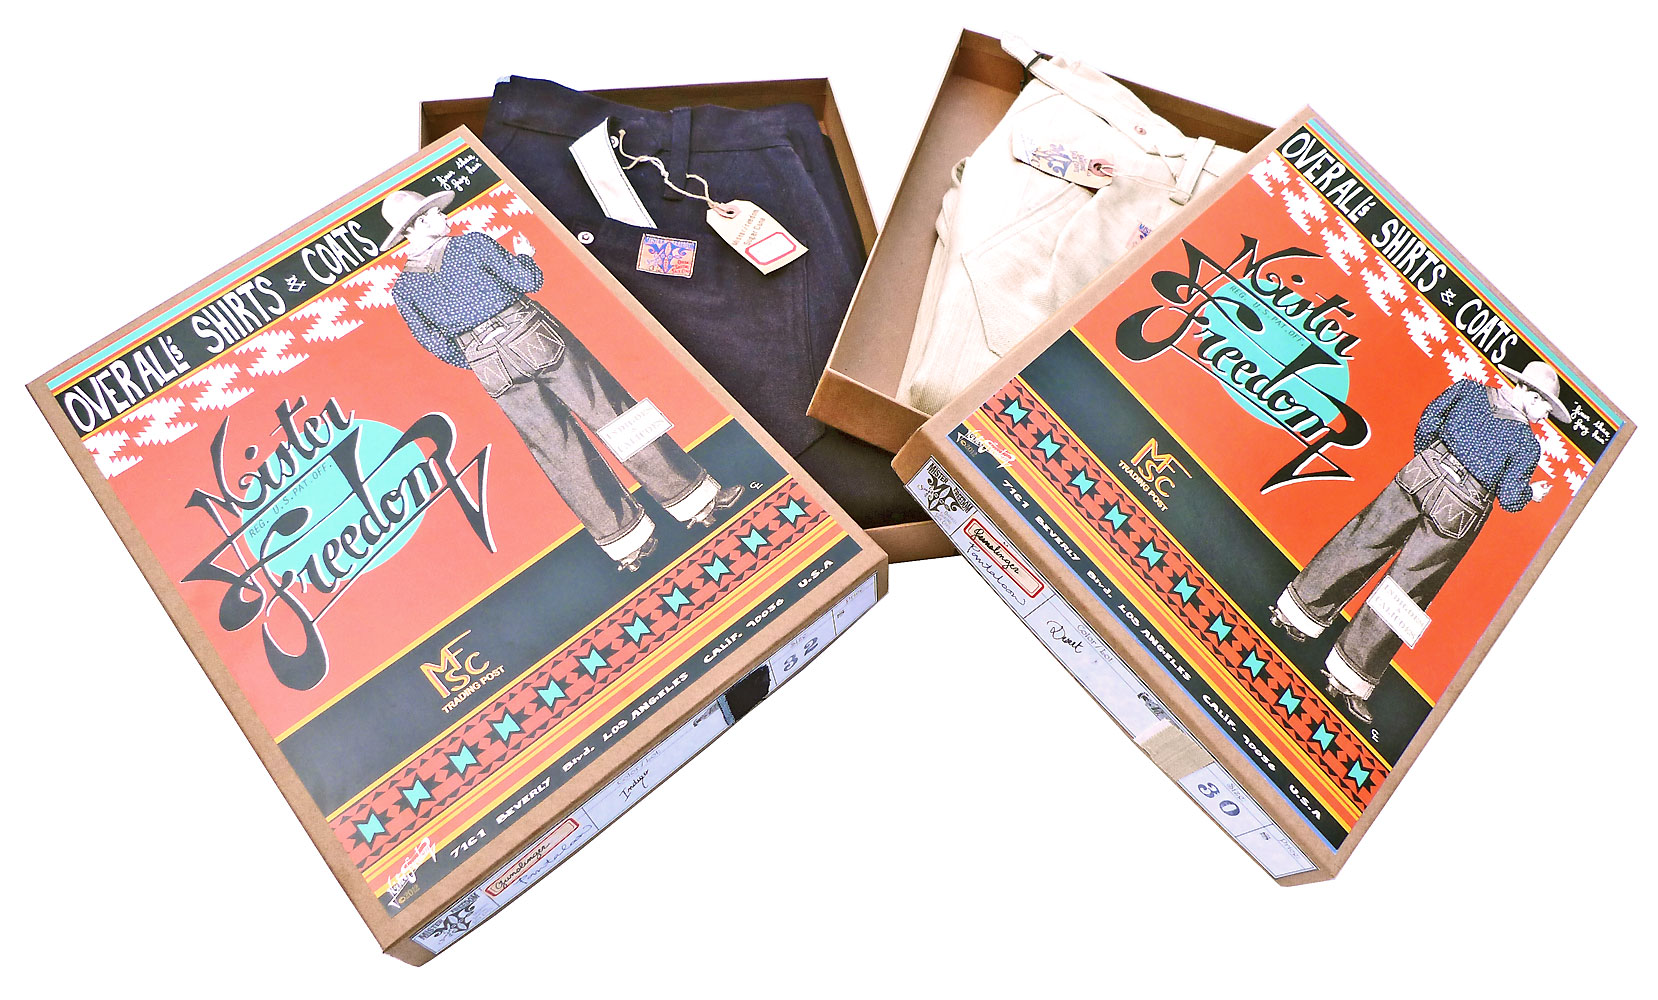 MFSC Gunslinger Pantaloons Box